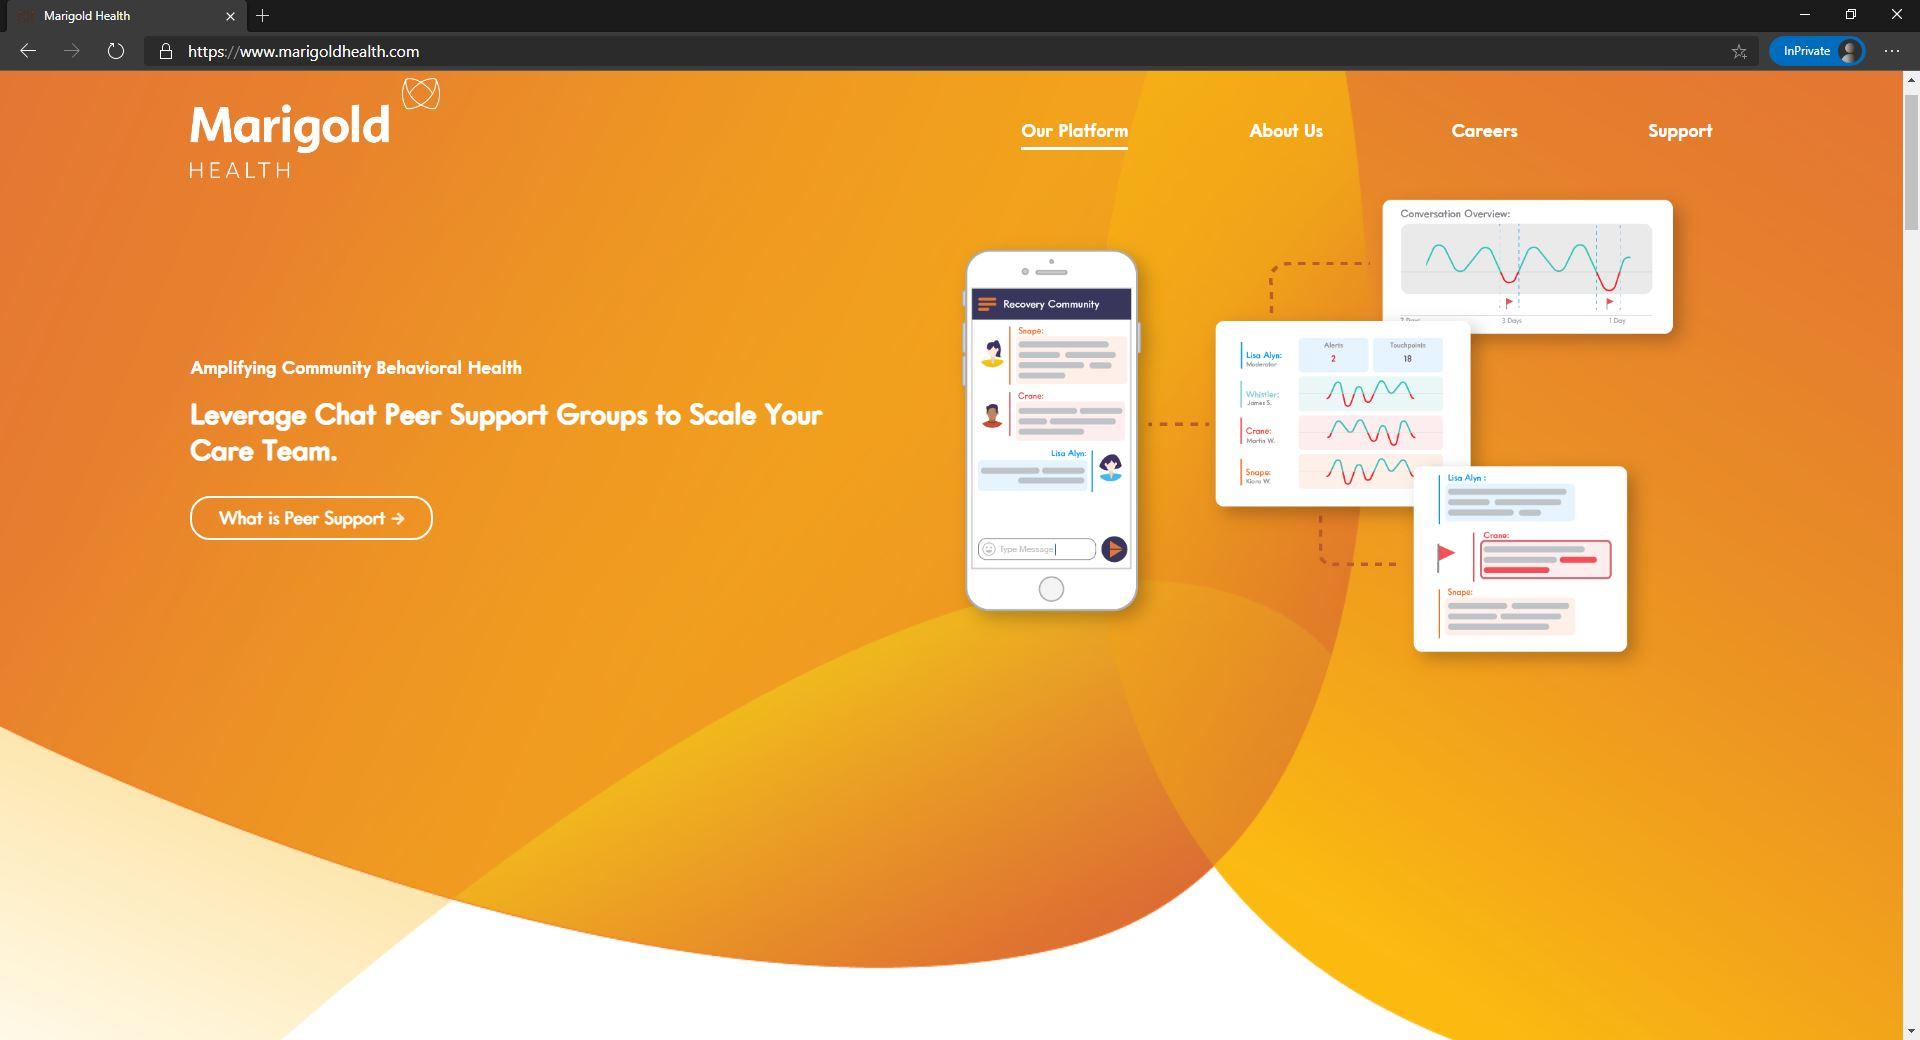 Marigold Health website homepage